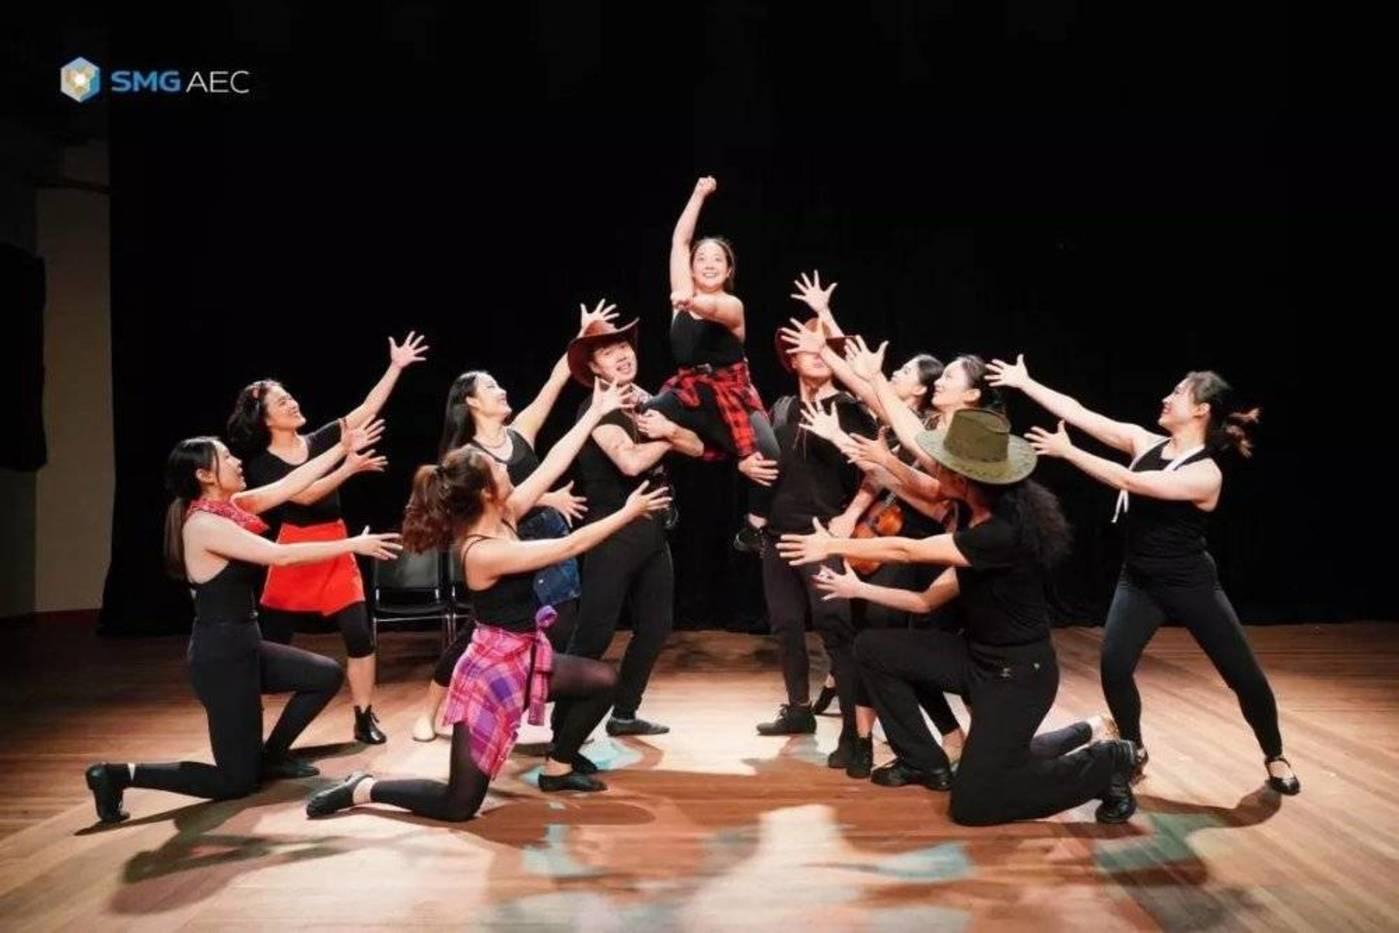 SMG Live演艺人才培训计划——伦敦西区明星音乐剧课程第二期汇报演出